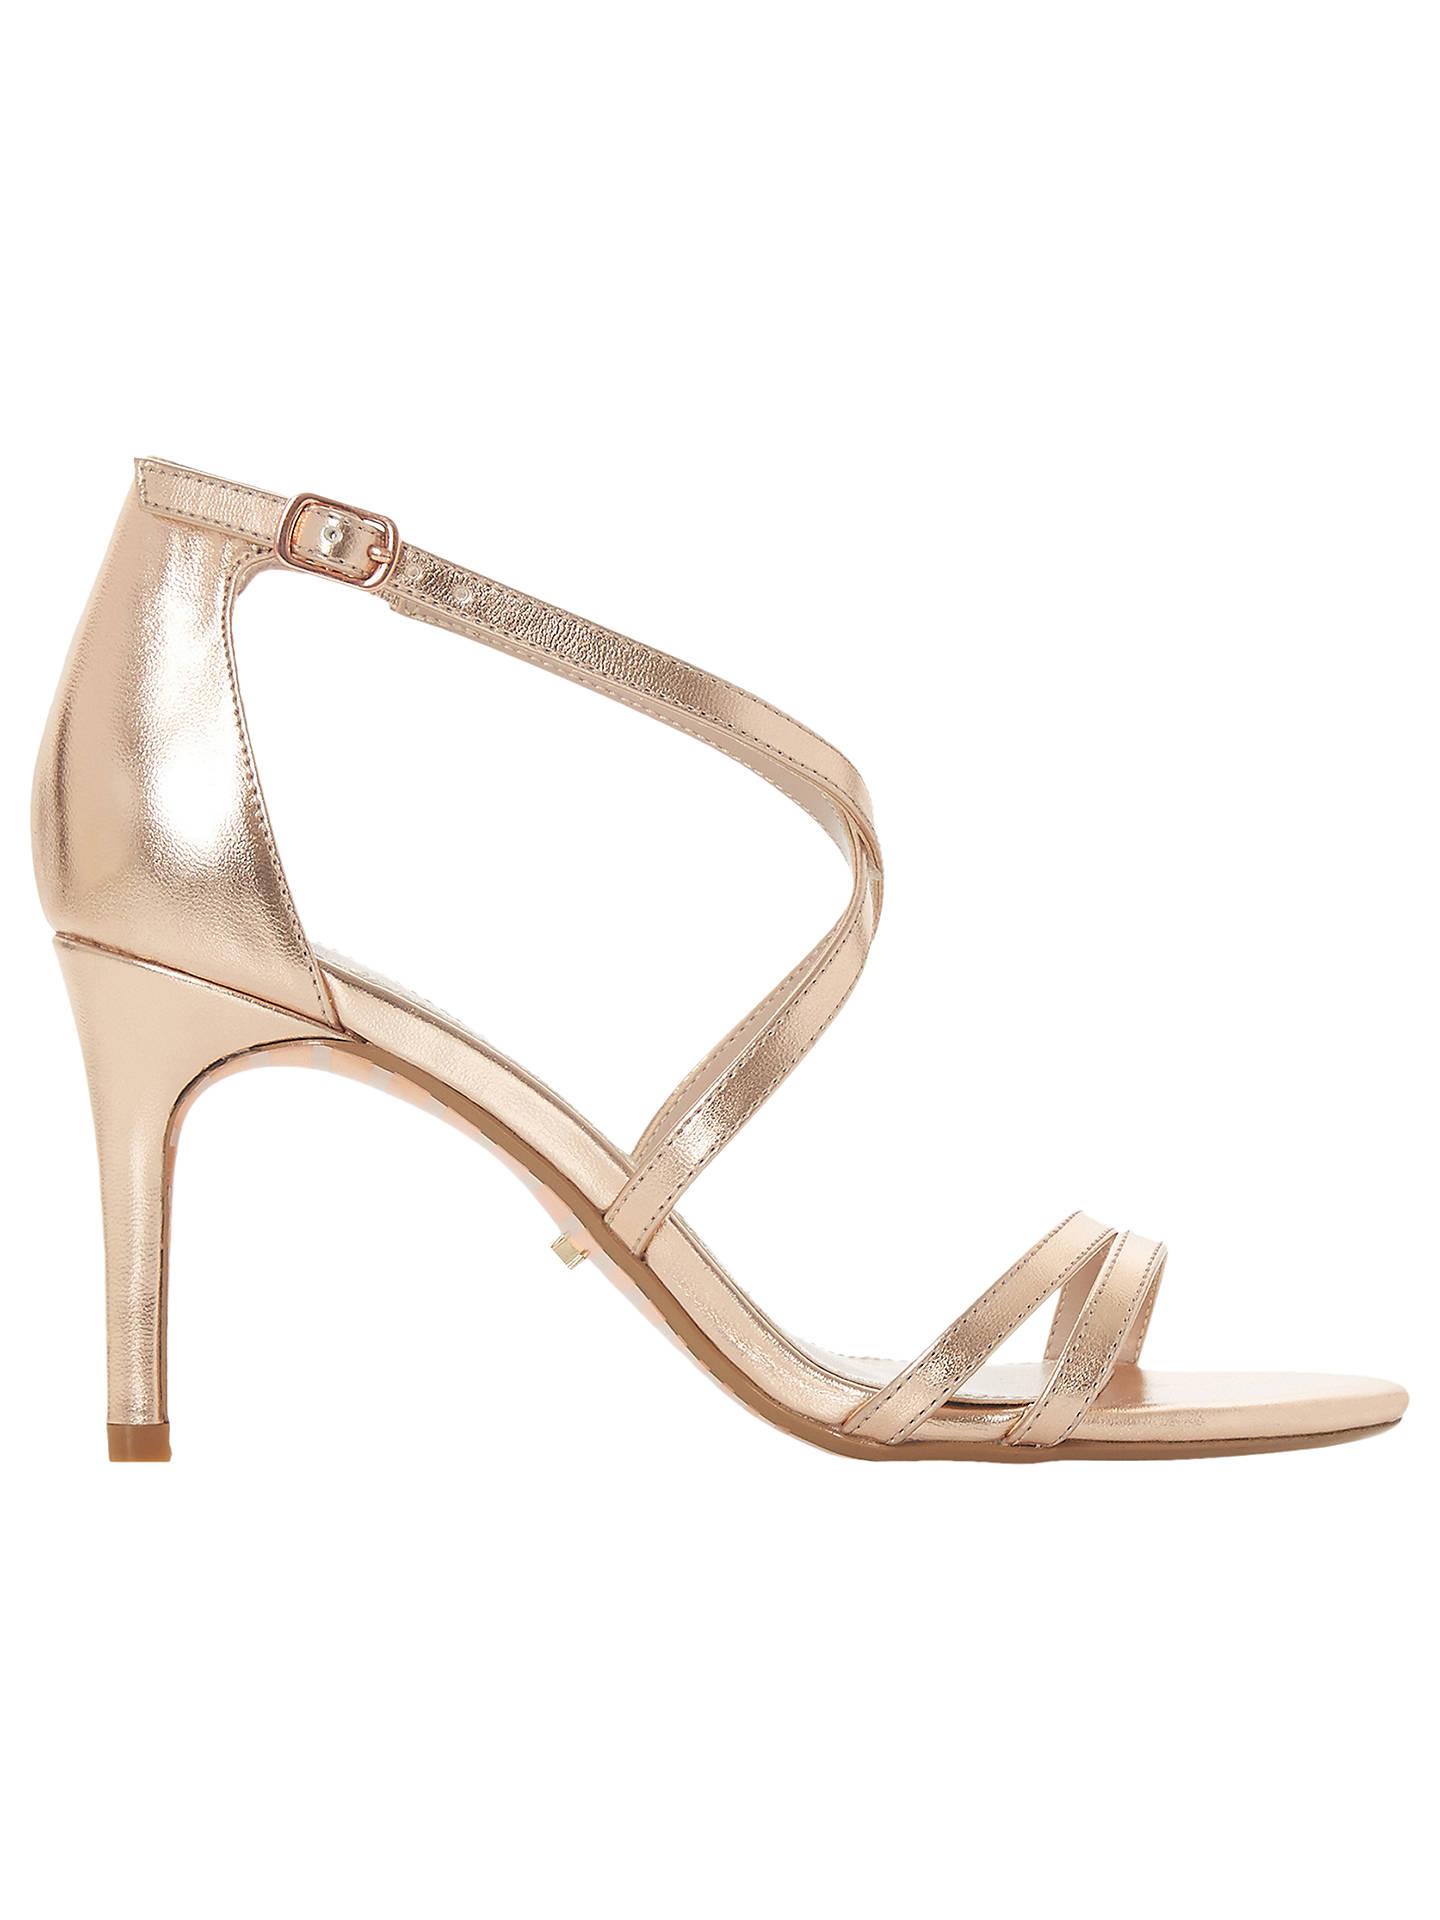 bd9626738 Buy Dune Mariela Cross Strap Stiletto Heeled Sandals